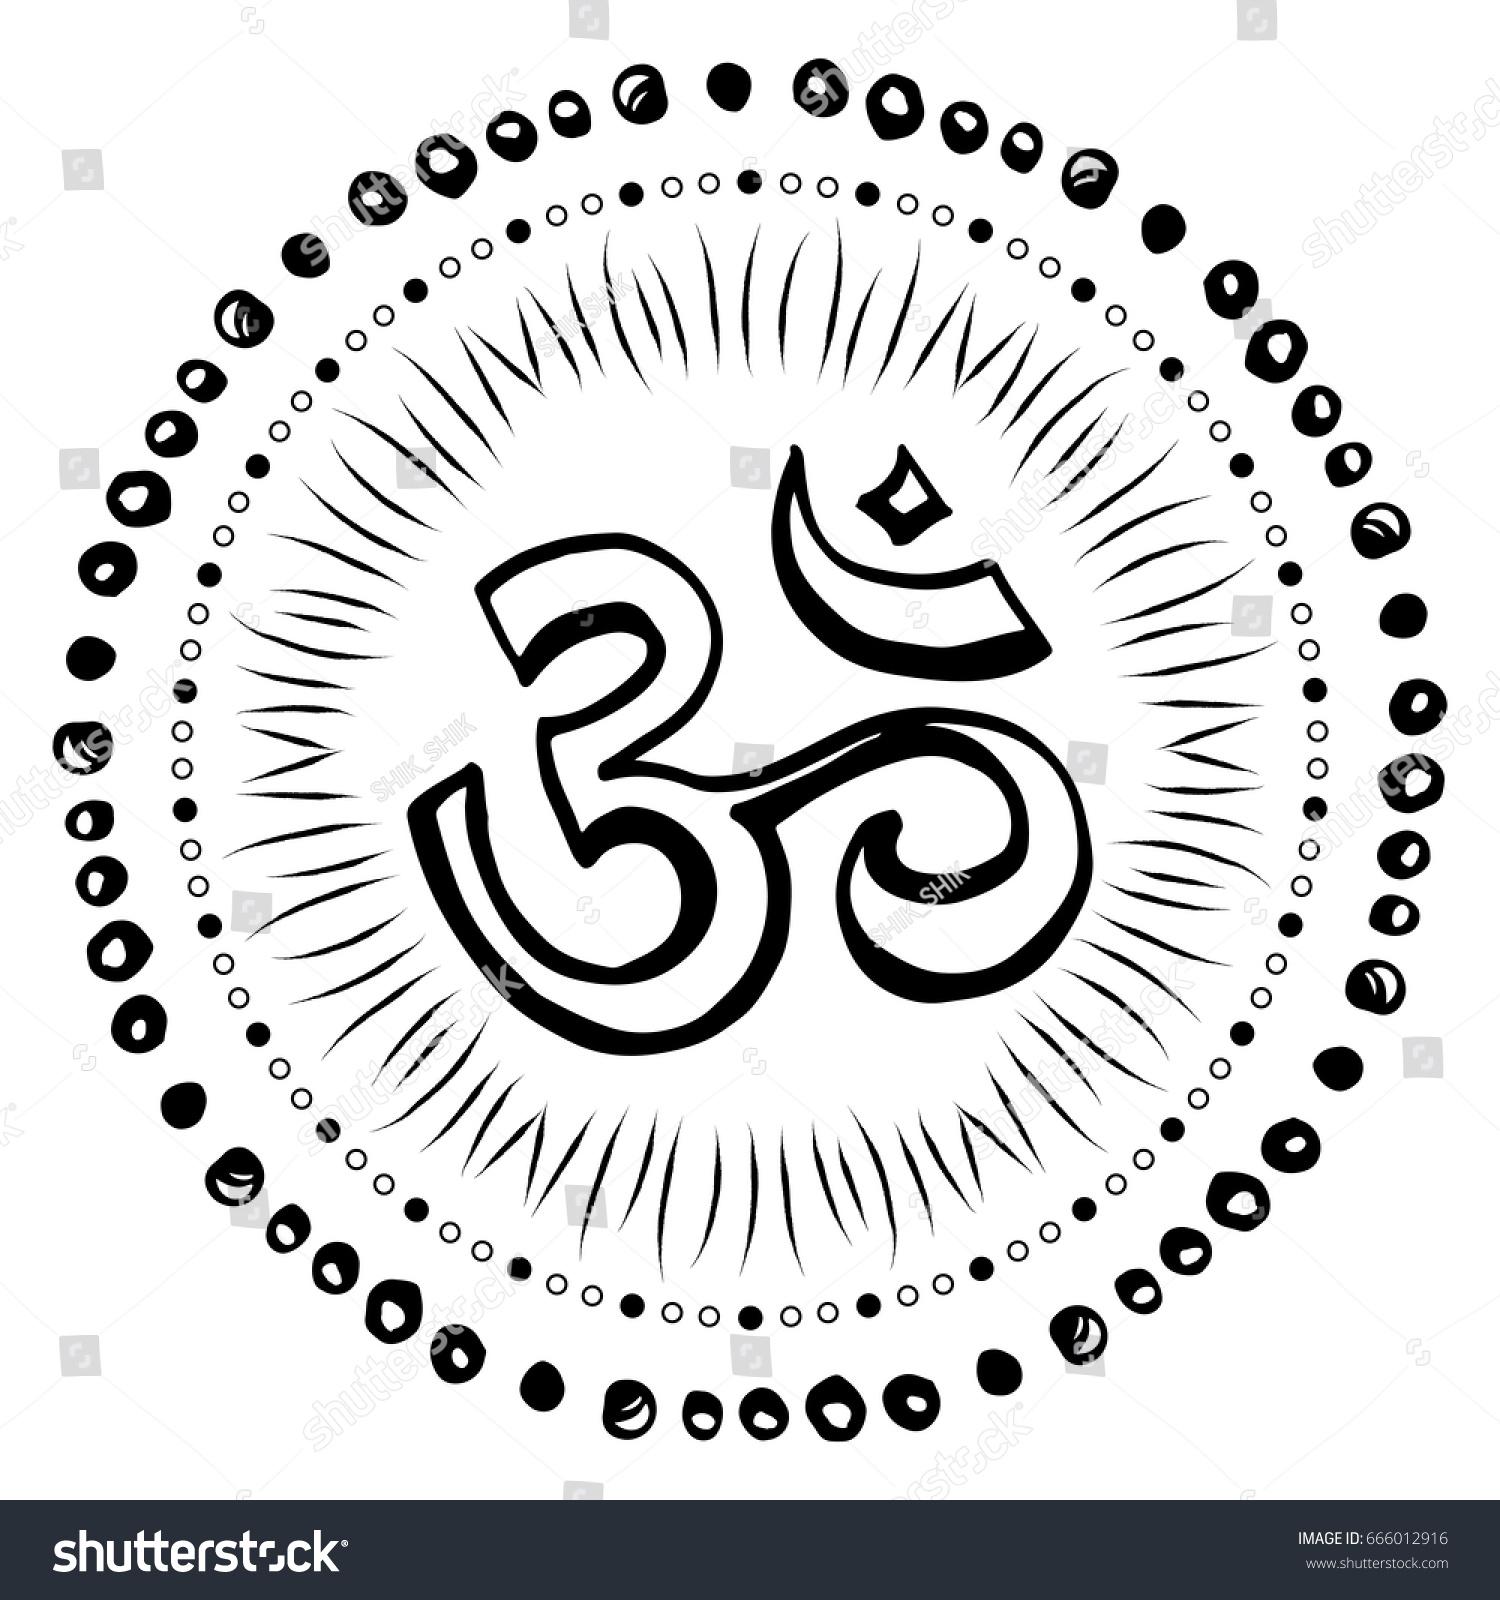 Om Aum Indian Sacred Sound Original Stock Vector 666012916